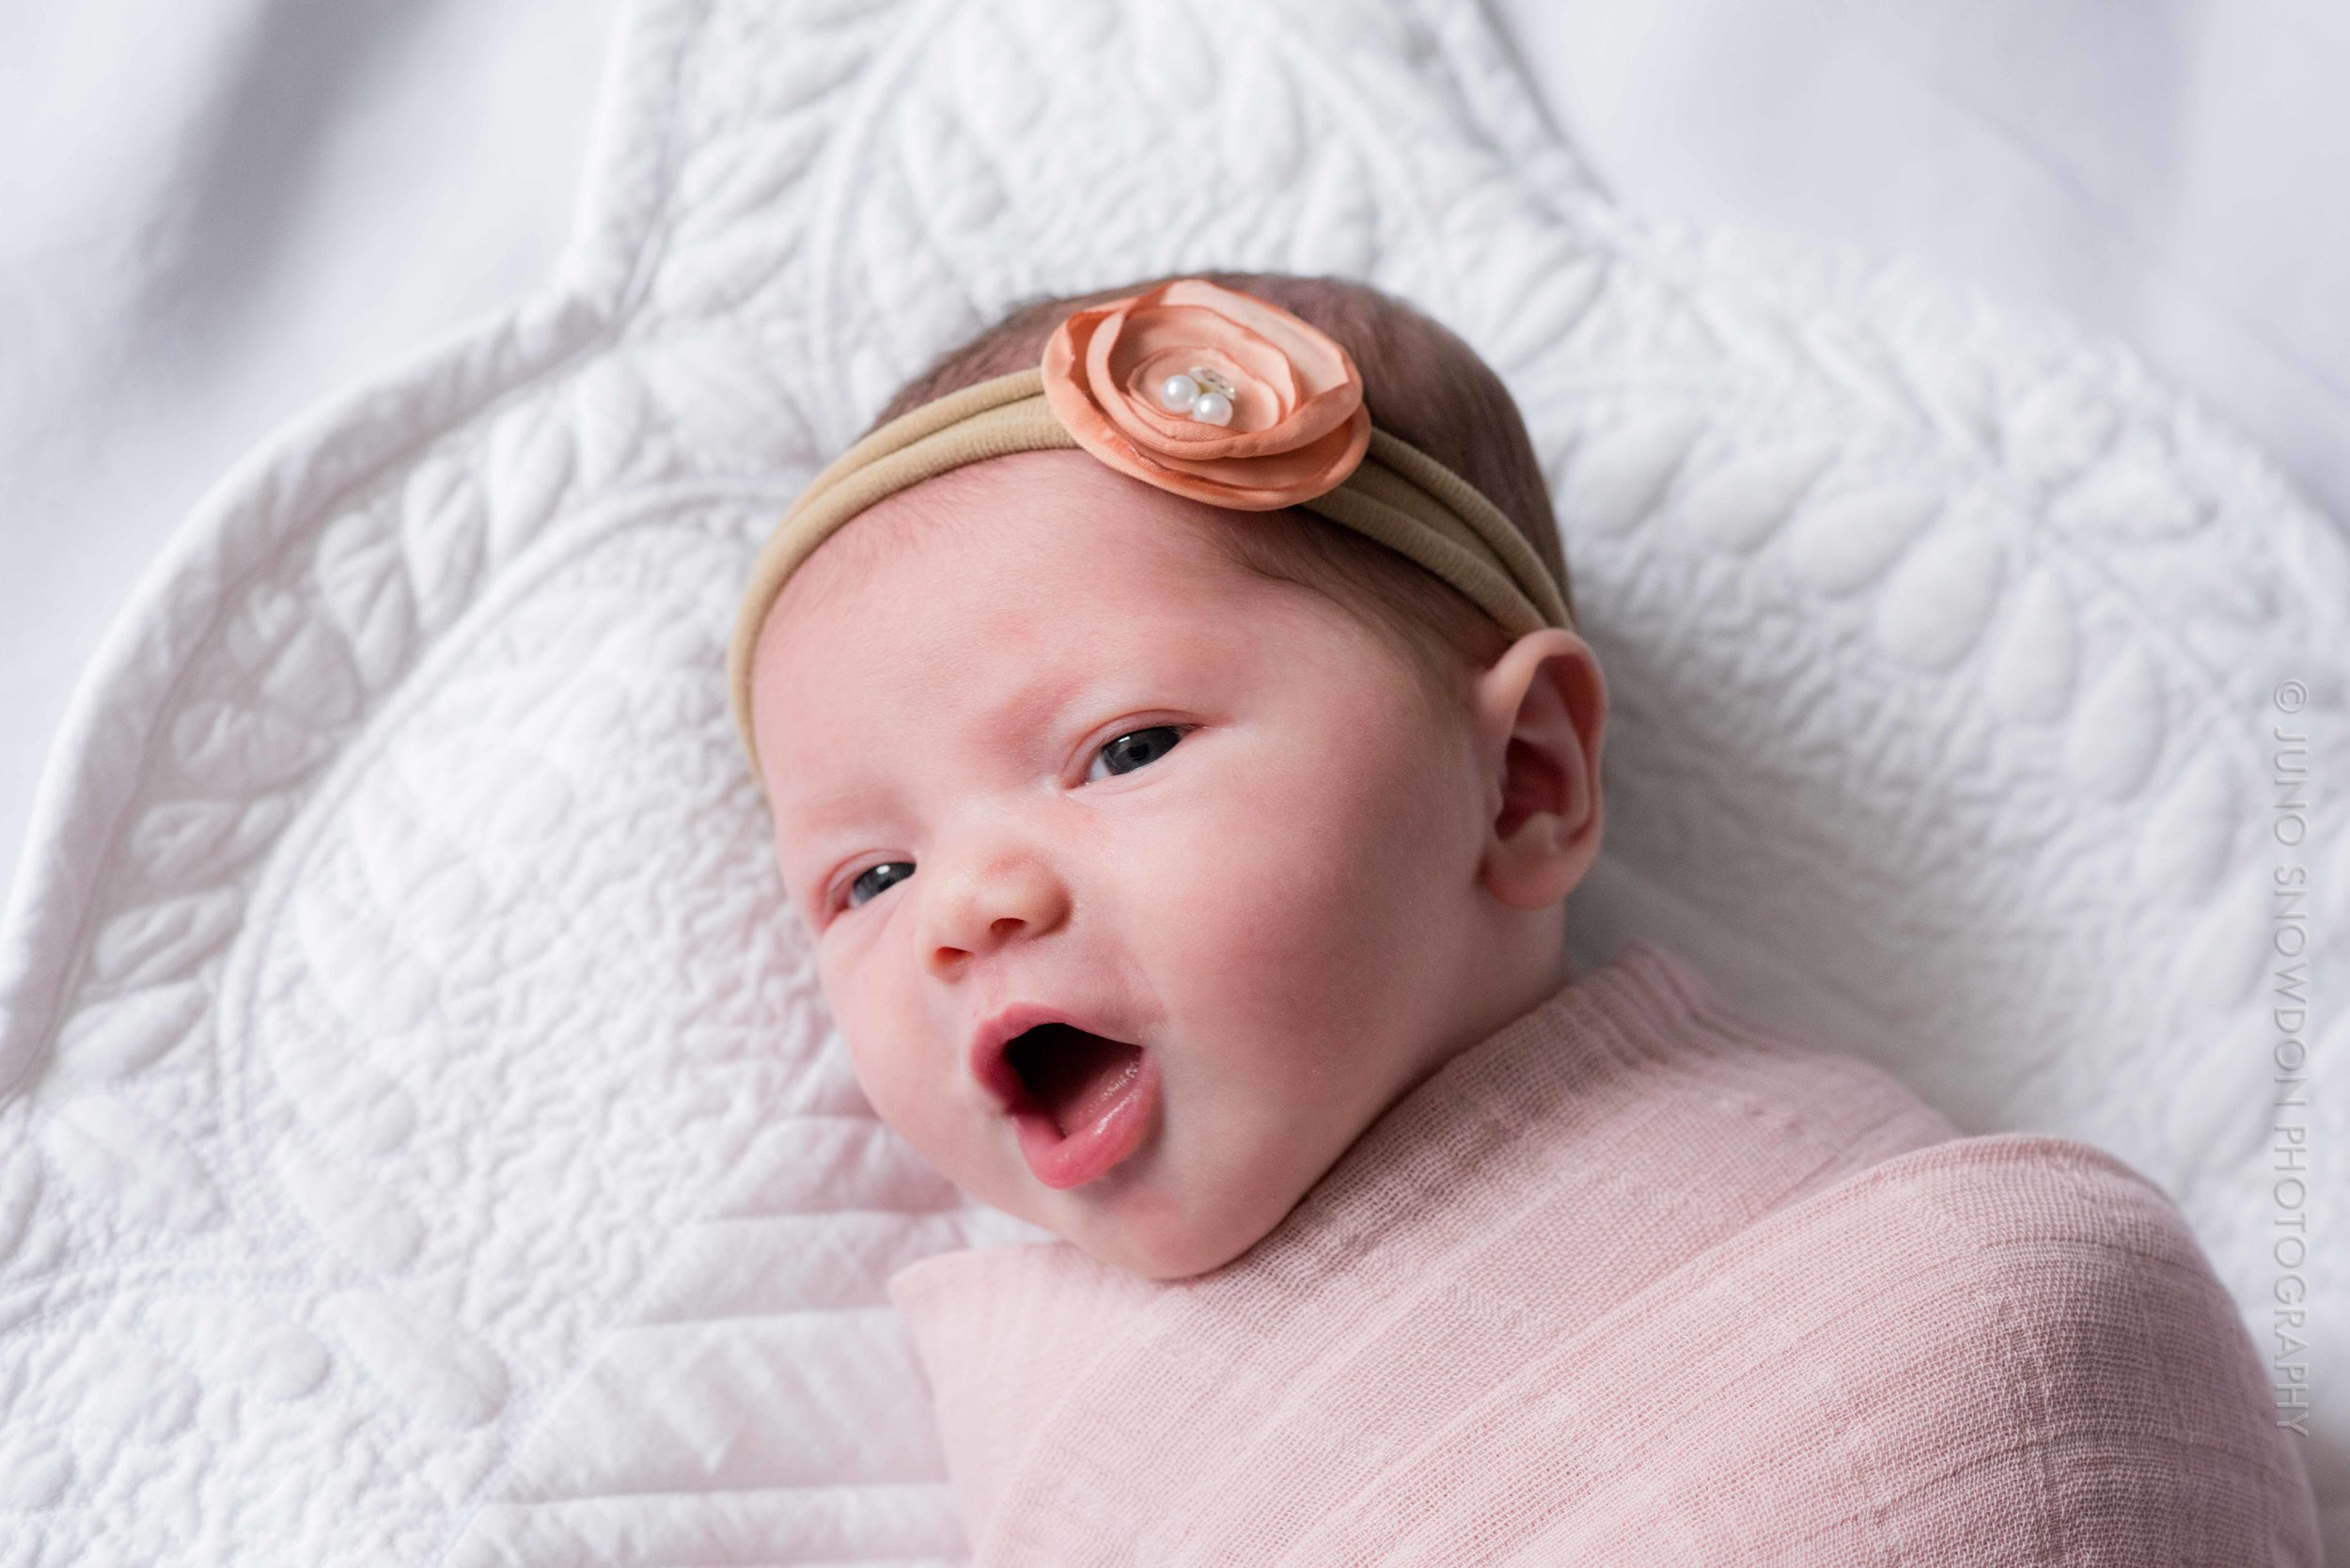 juno-snowdon-photography-newborn-portrait-7312.jpg